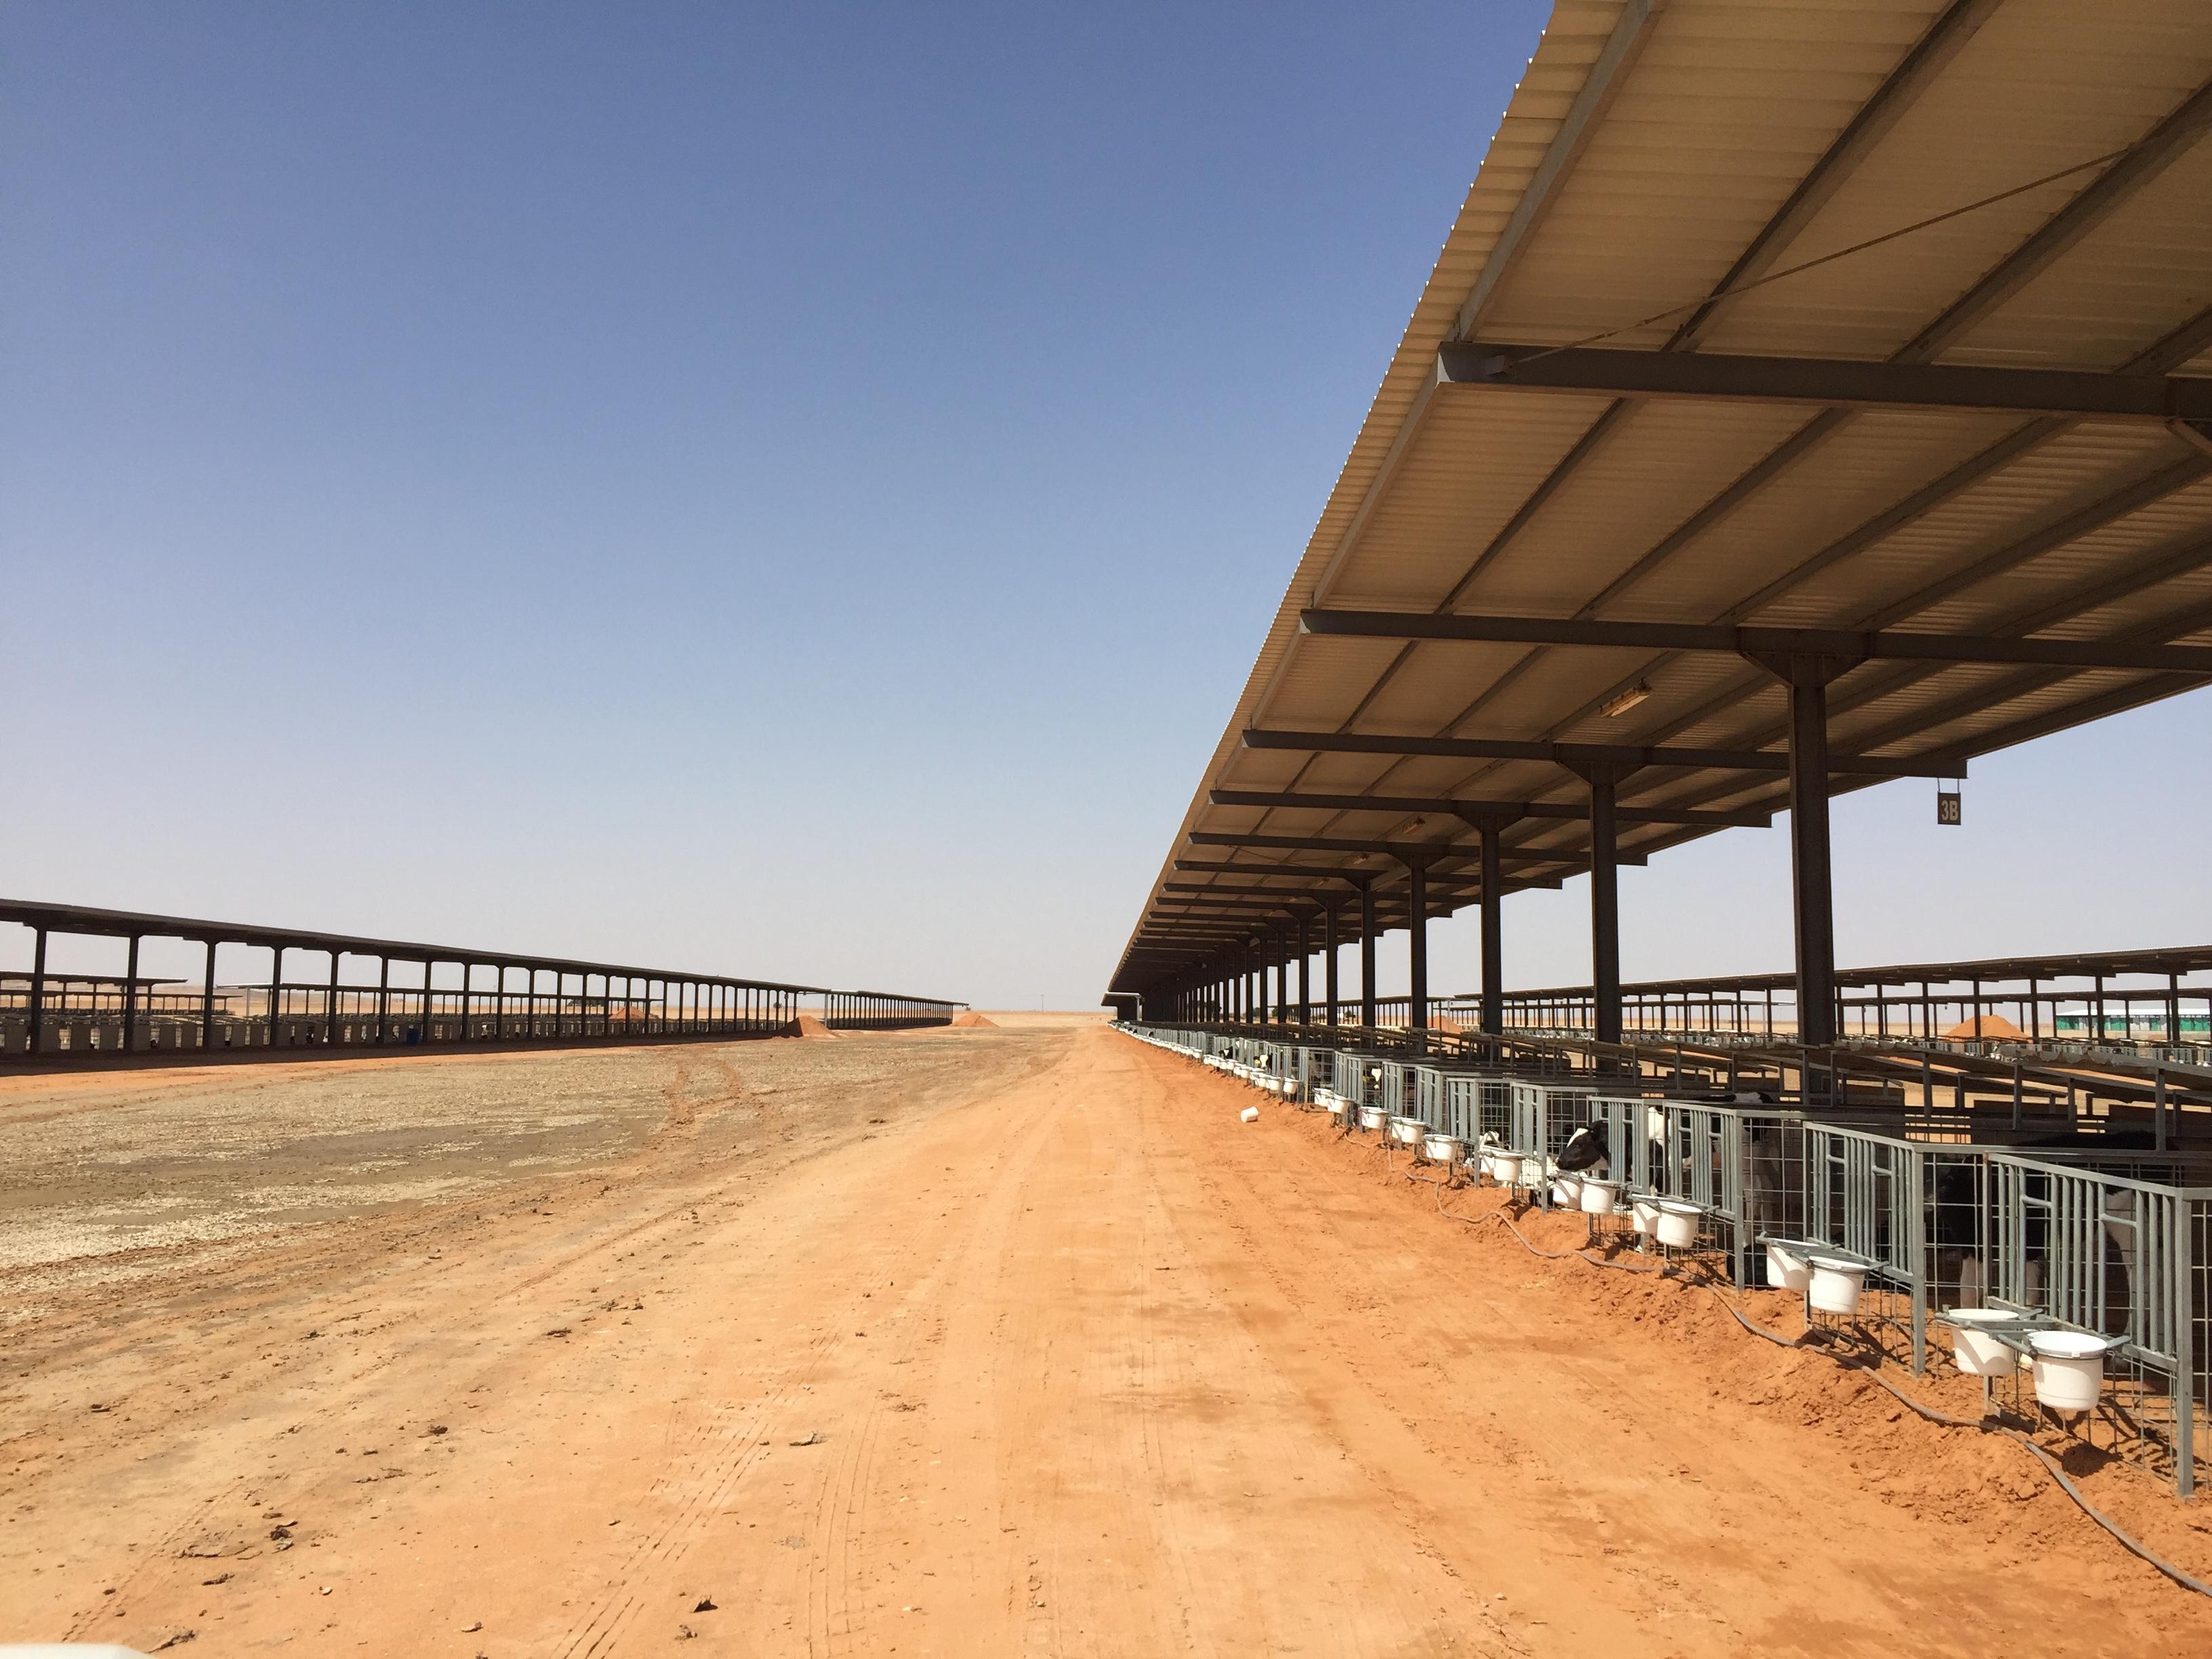 Pics: Milking 22,500 cows in the Saudi Arabian desert - Agriland ie